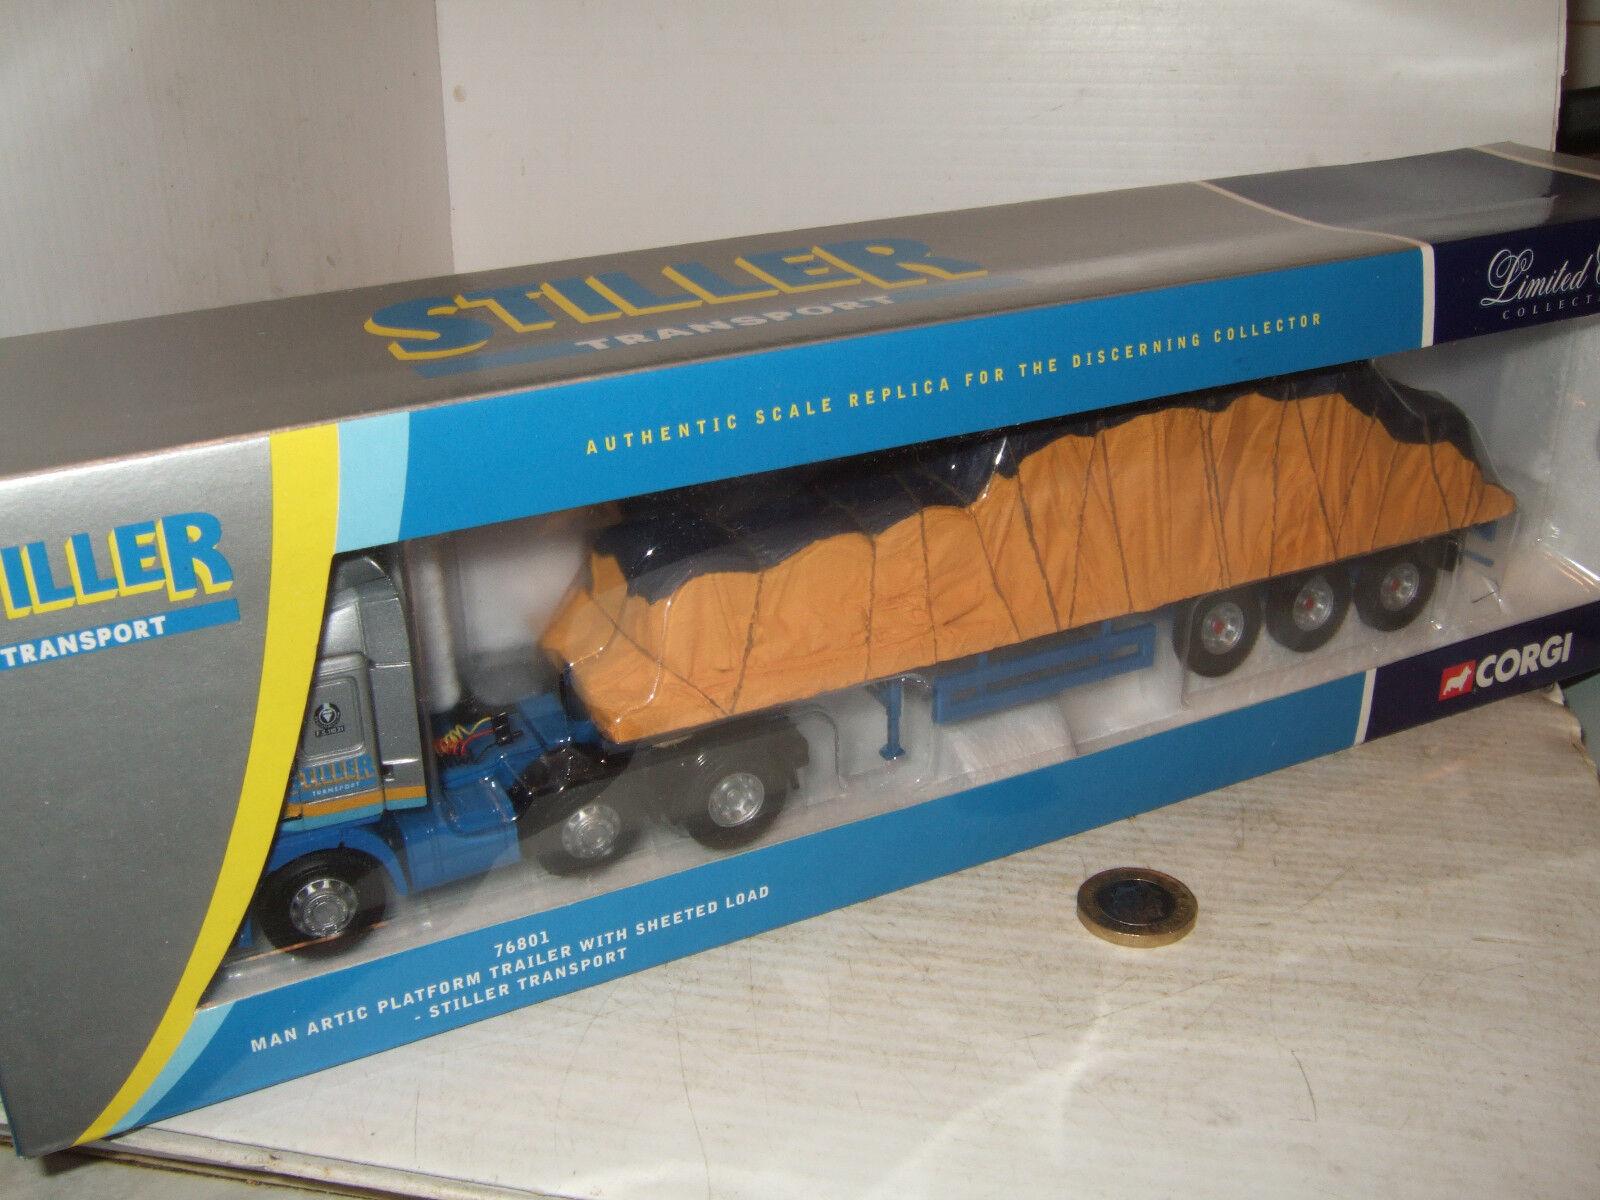 Corgi 76801 Man Artic Platform Trailer & Sheeted load -Stiller Transport 1 50